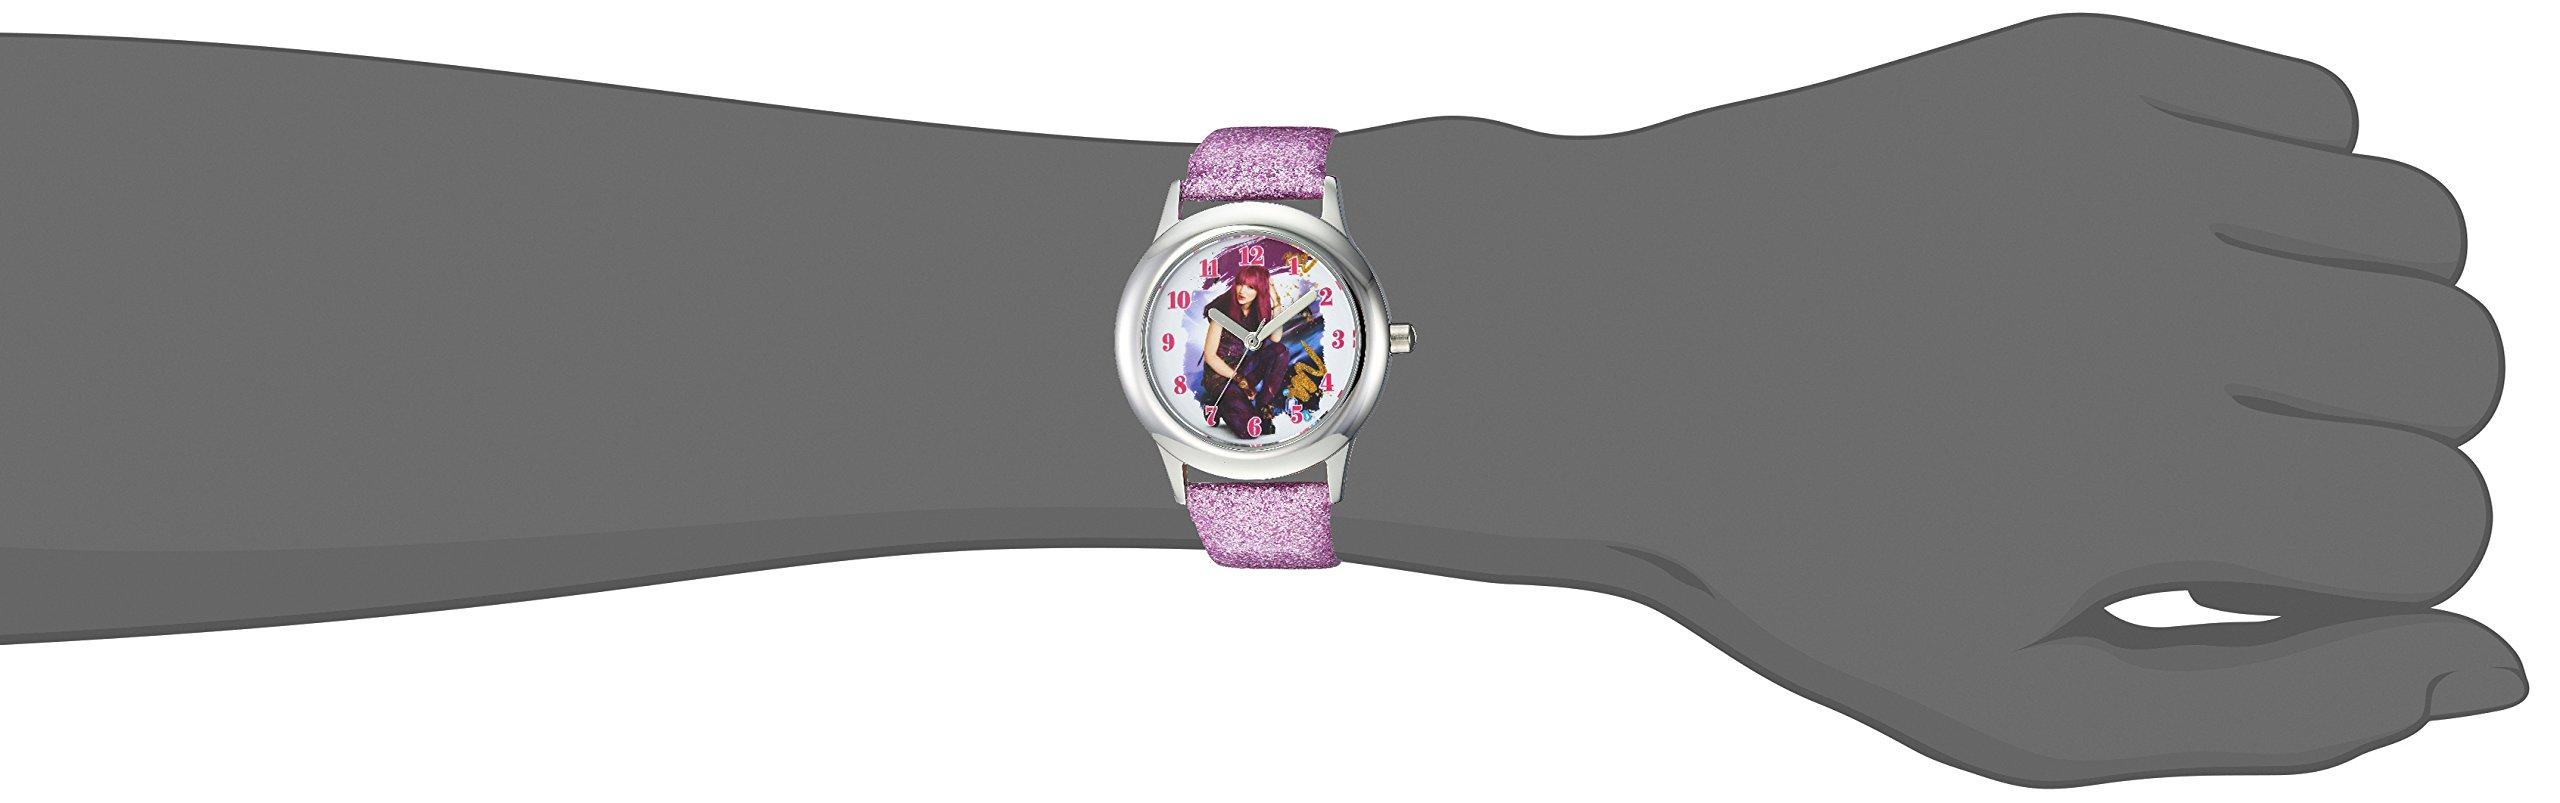 DISNEY Girl's Descendants 2' Quartz Stainless Steel Casual Watch, Color:Purple (Model: WDS000247) by Disney (Image #2)